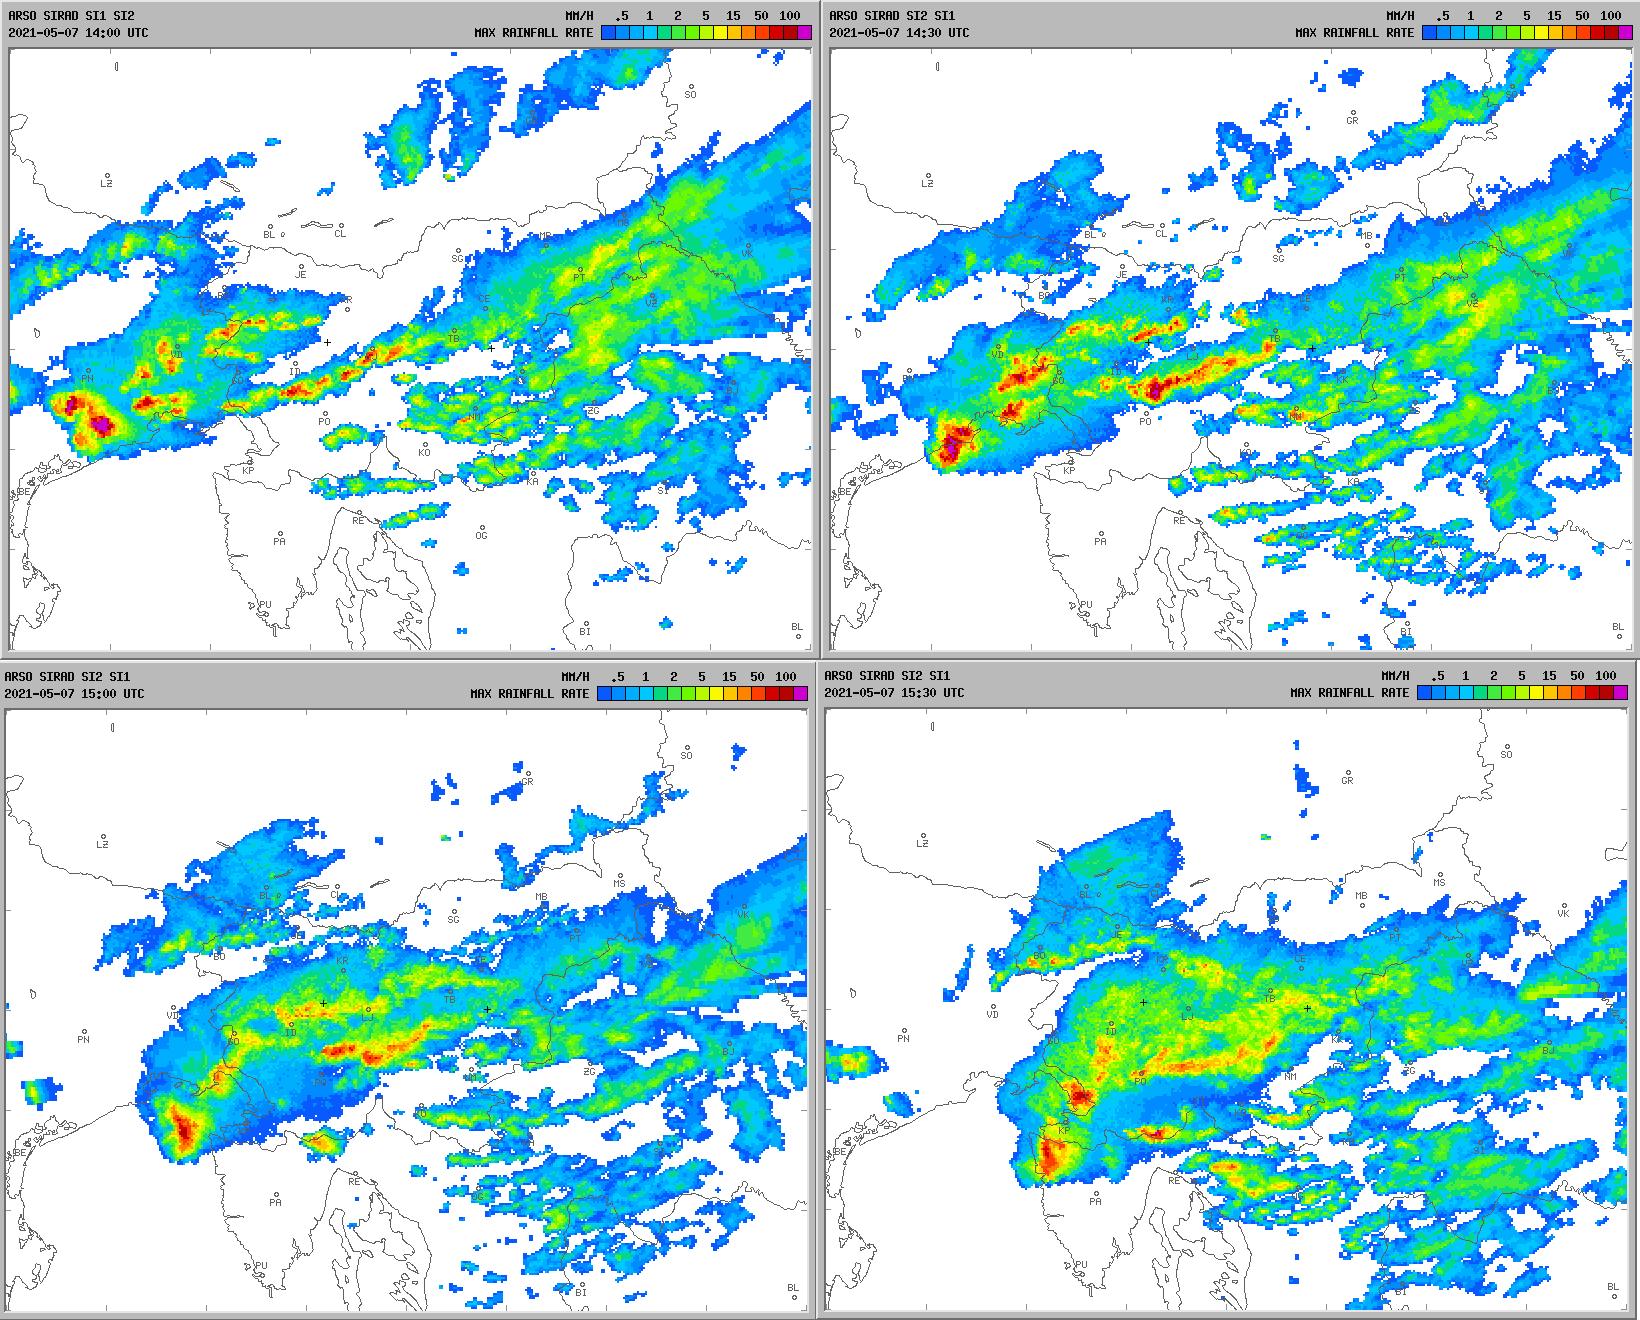 supercell-storm-shelf-trieste-gulf-radar